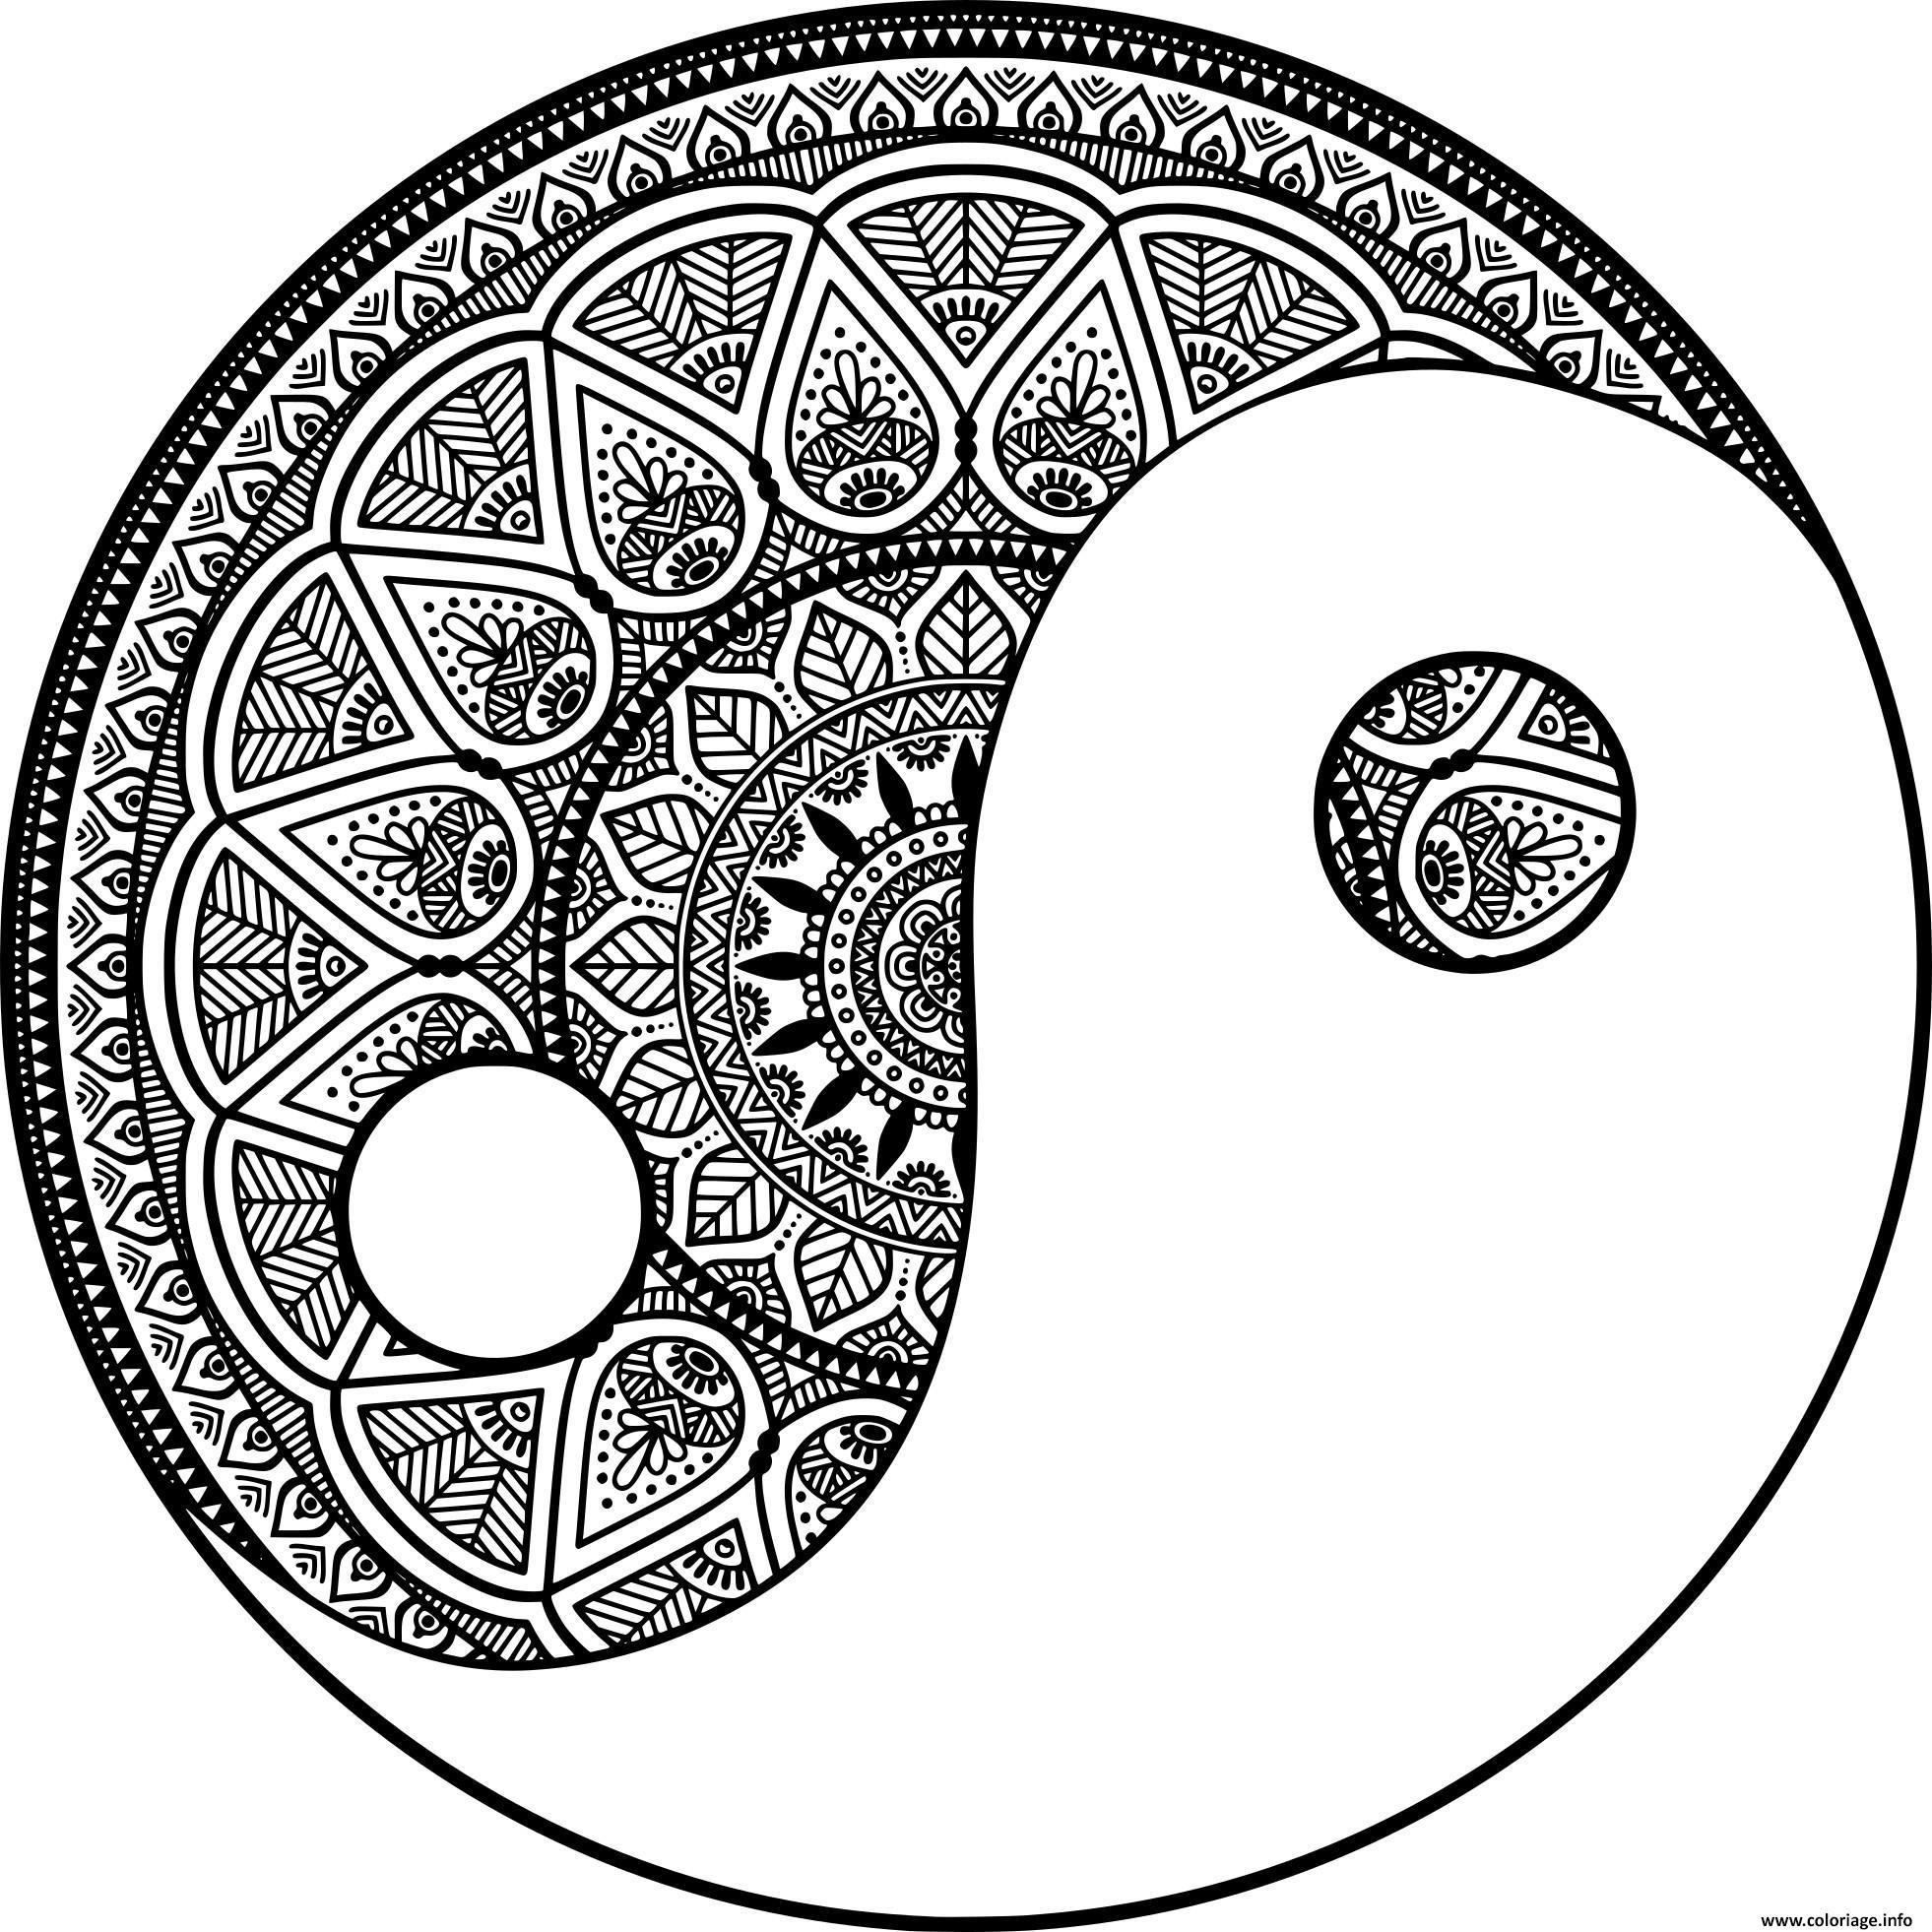 Coloriage Mandala Zen Yin Et Yang Philosophie Chinoise Dessin Mandala A Imprimer